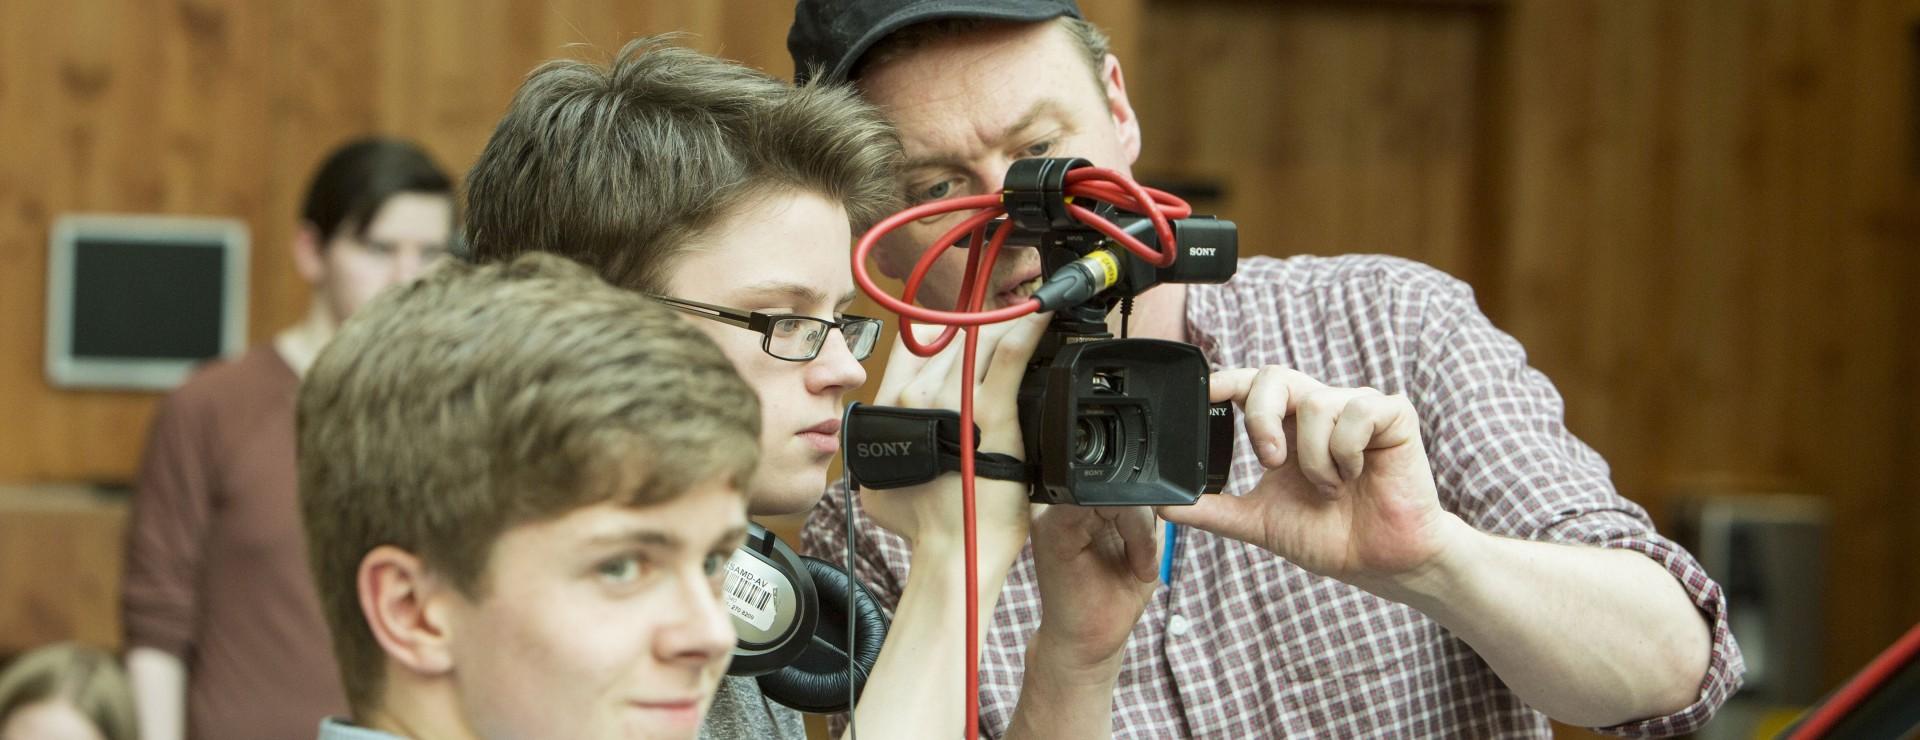 Shoot a Film Scene Image